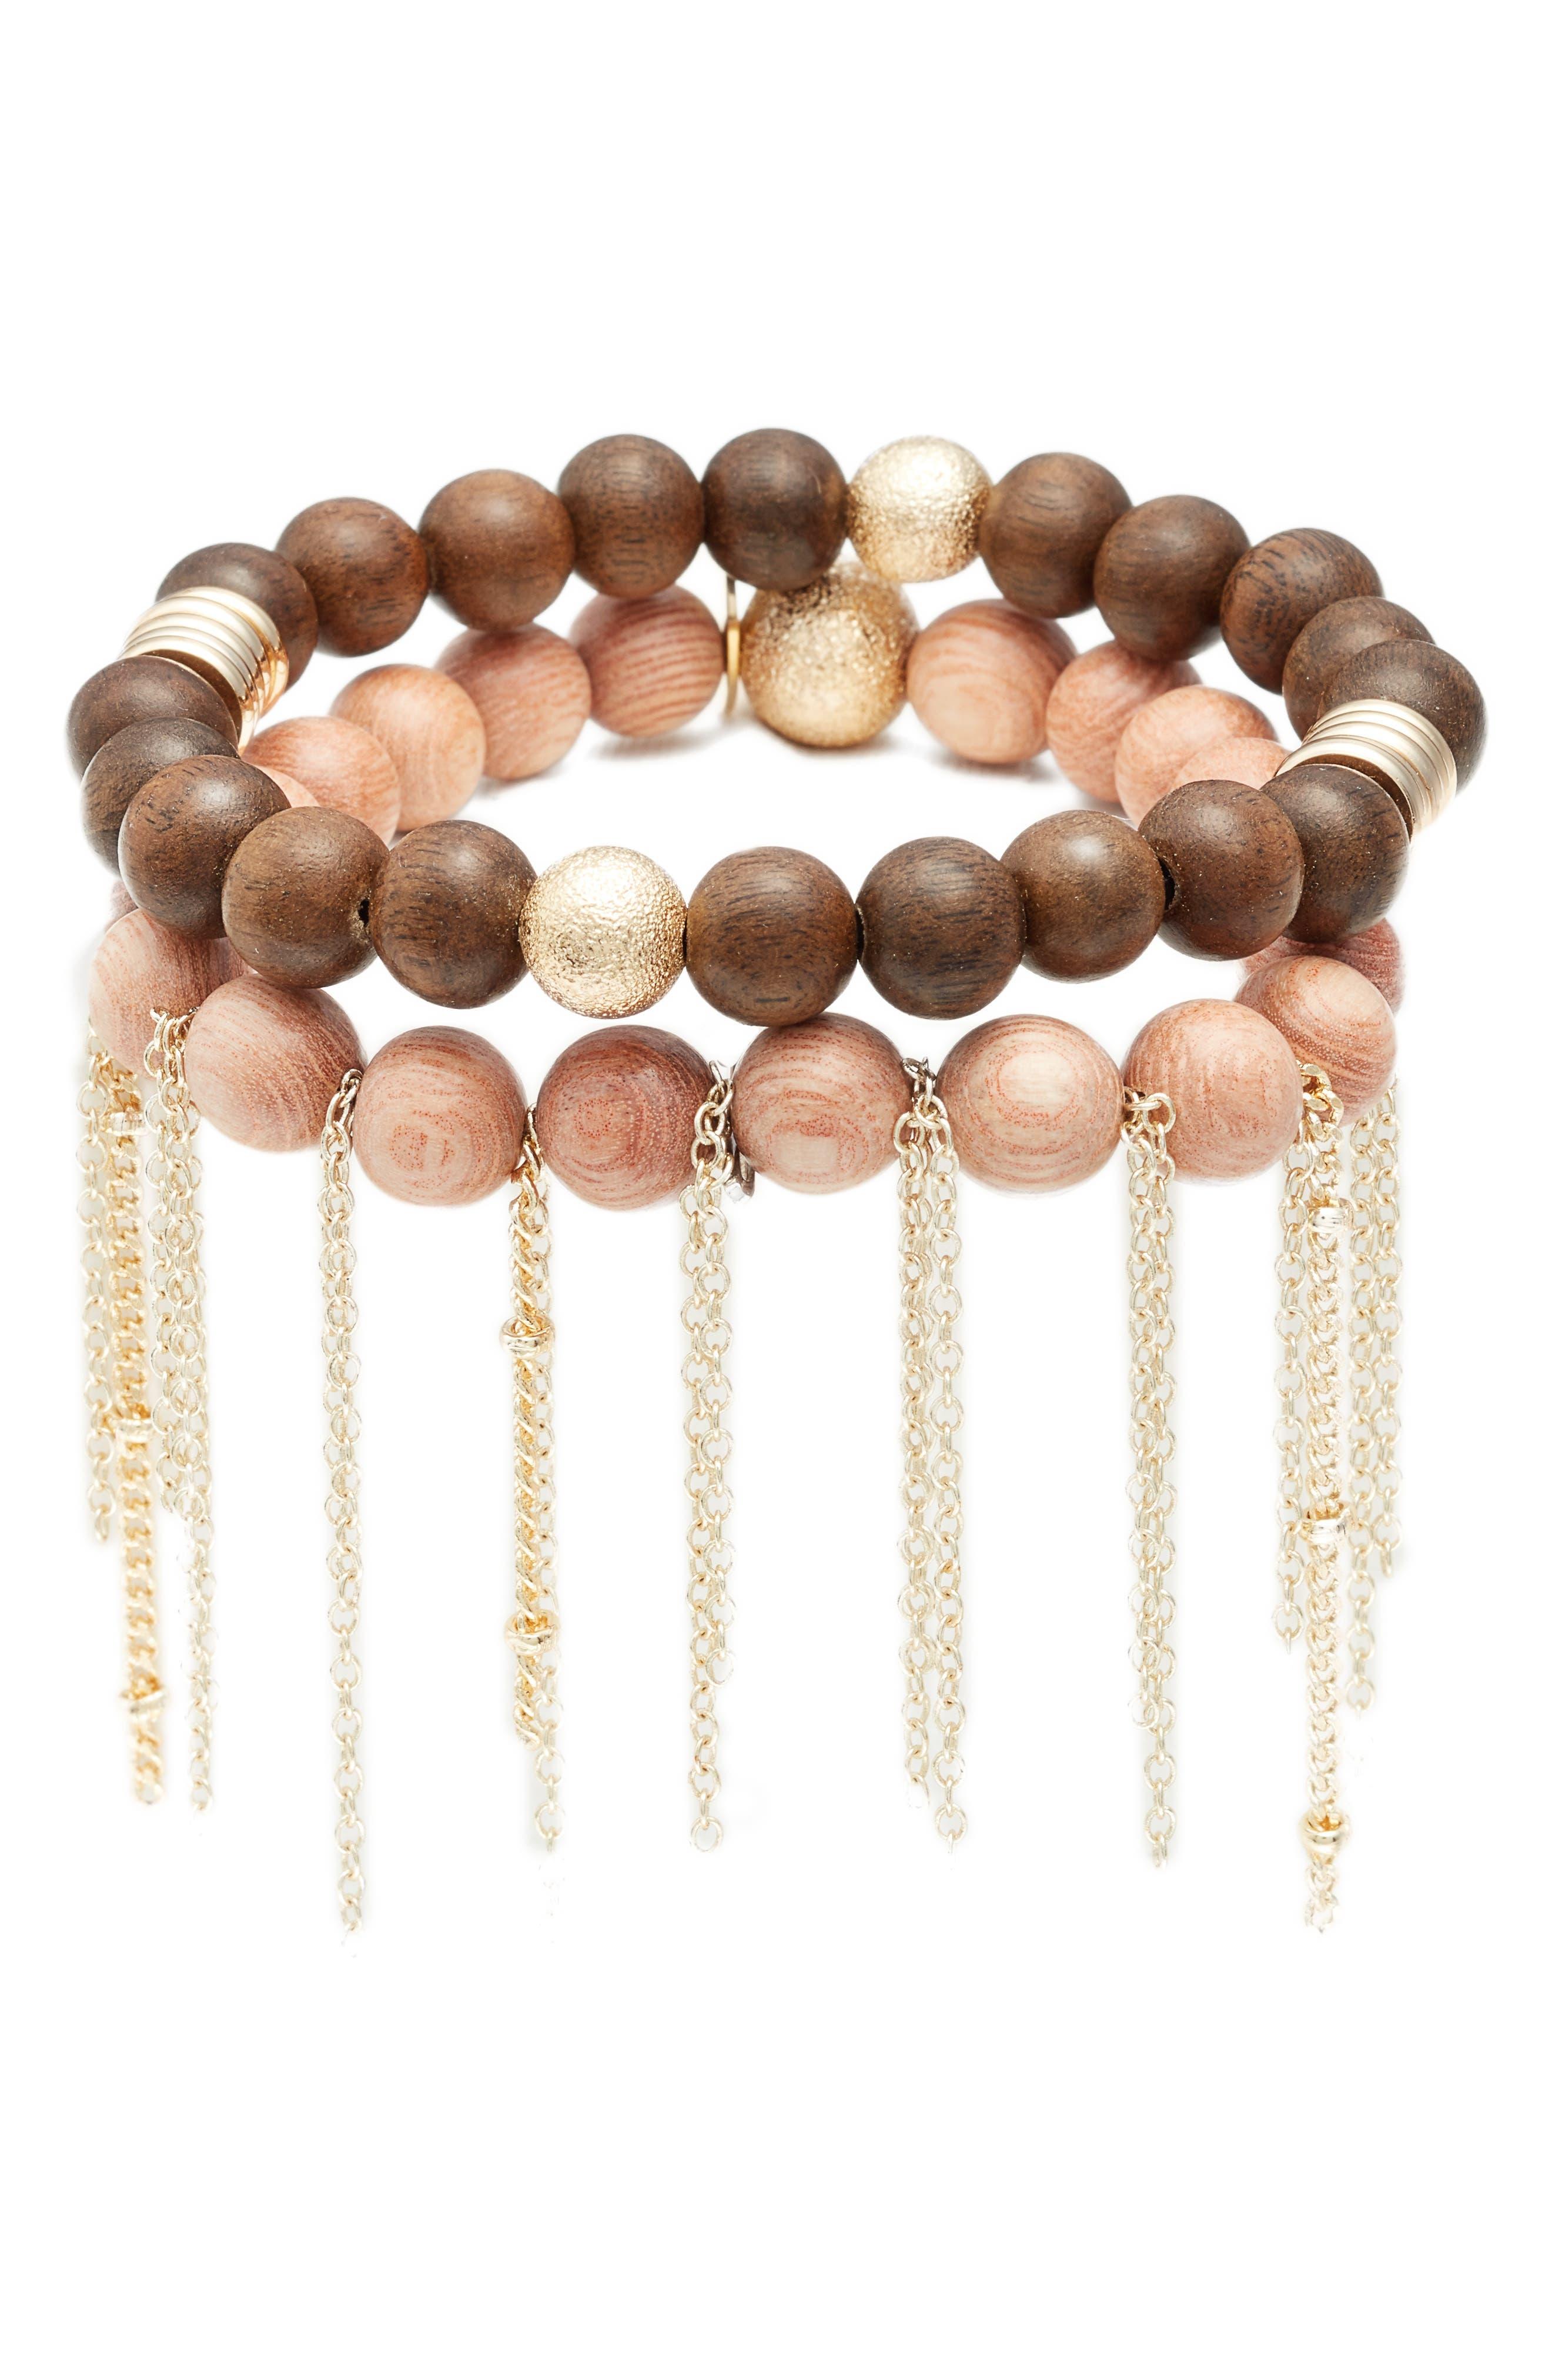 THE LACE PROJECT Set of 2 Bead Stretch Bracelet